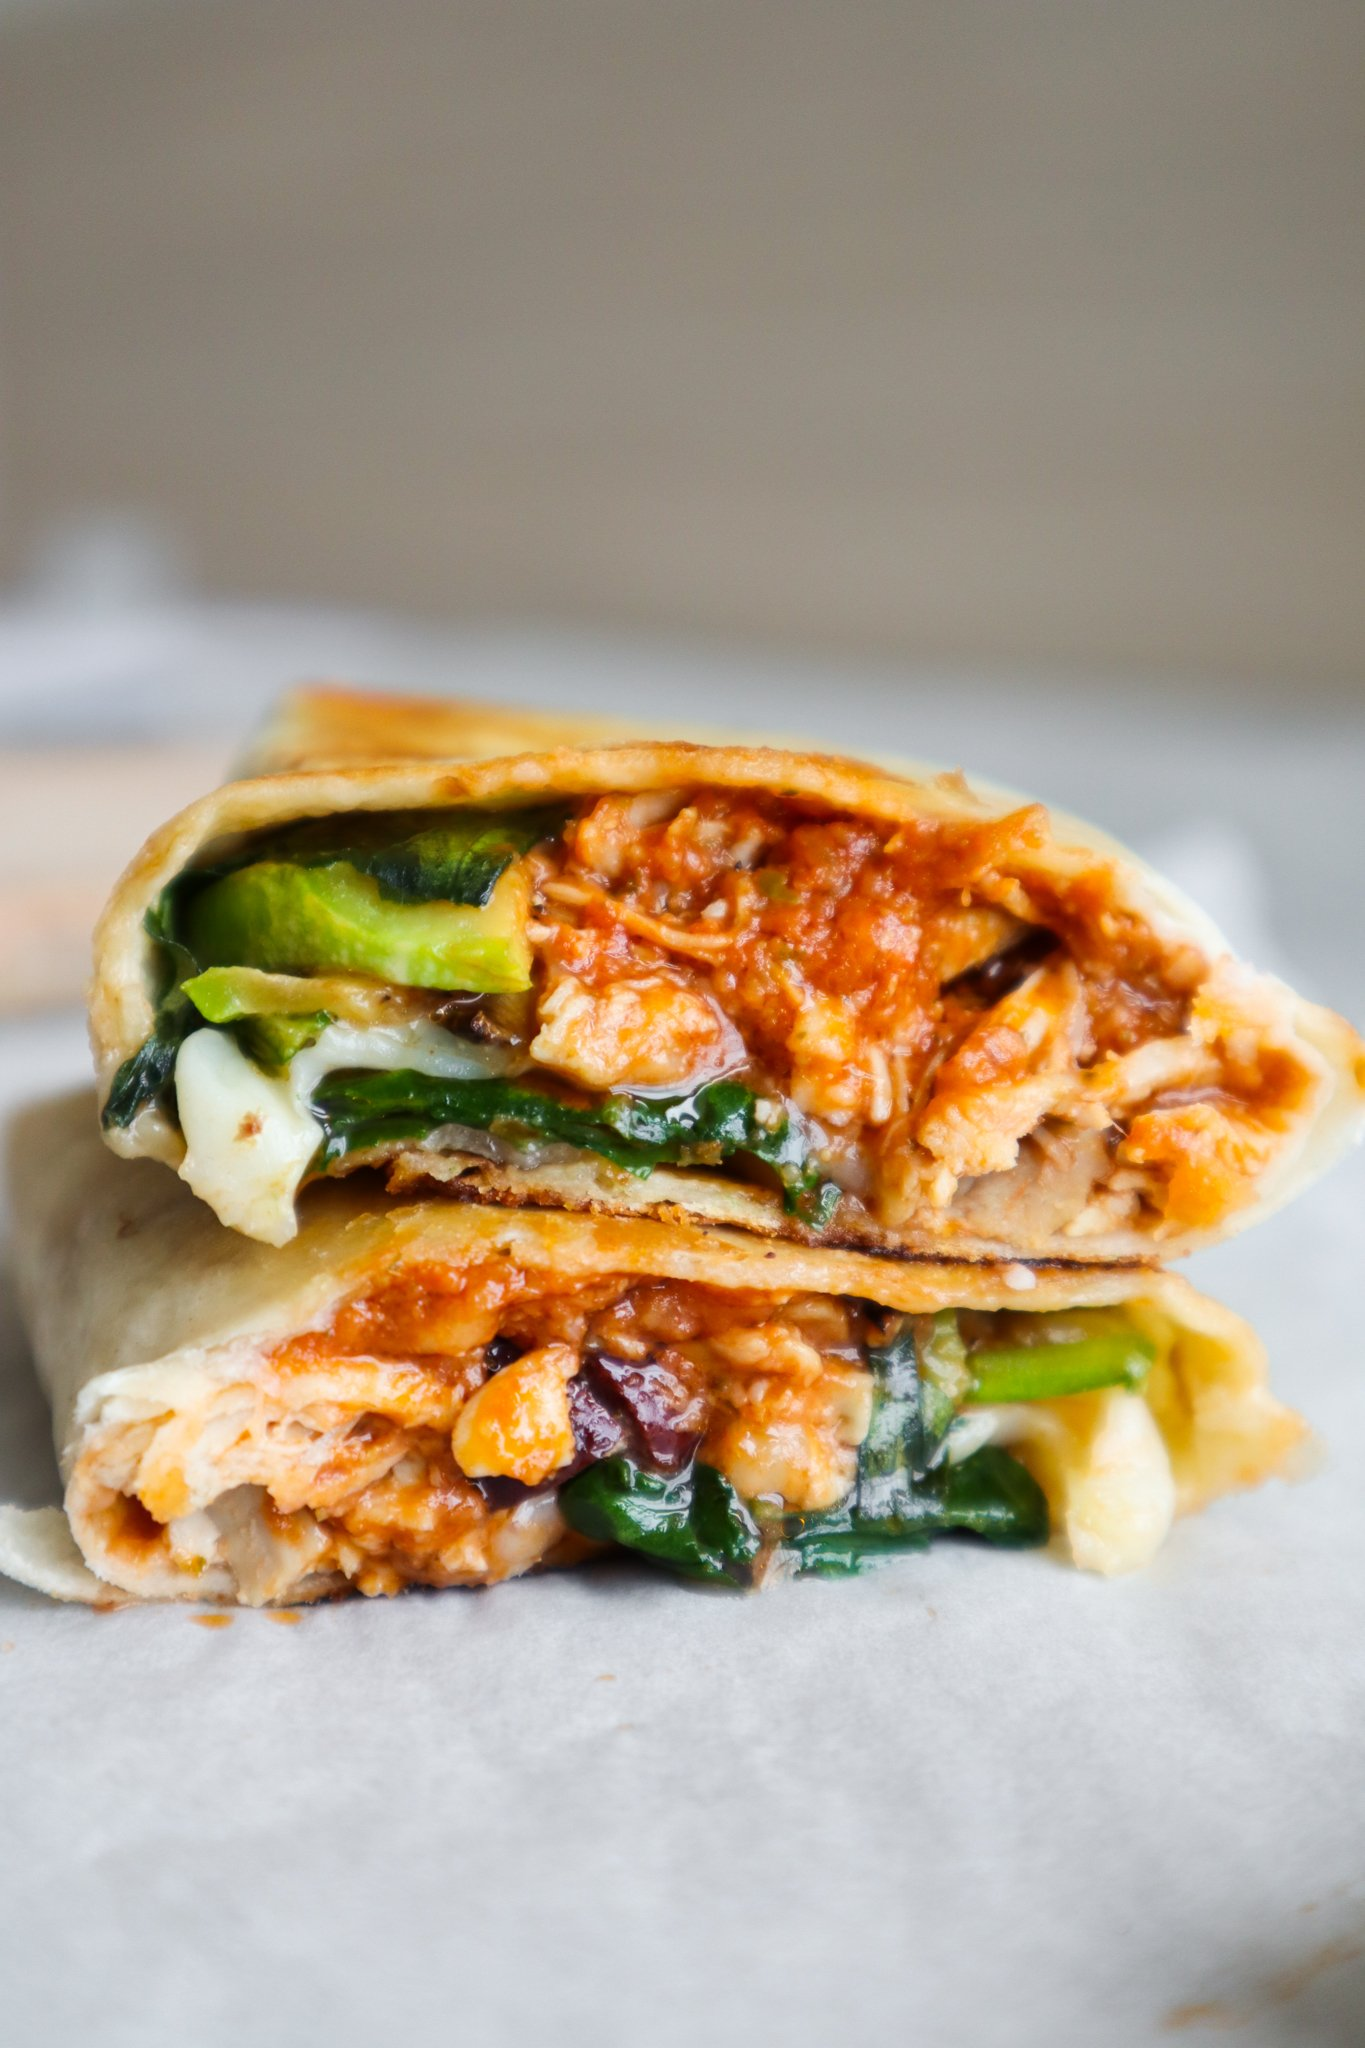 pesto parmesan chicken wraps - easy Mediterranean recipe